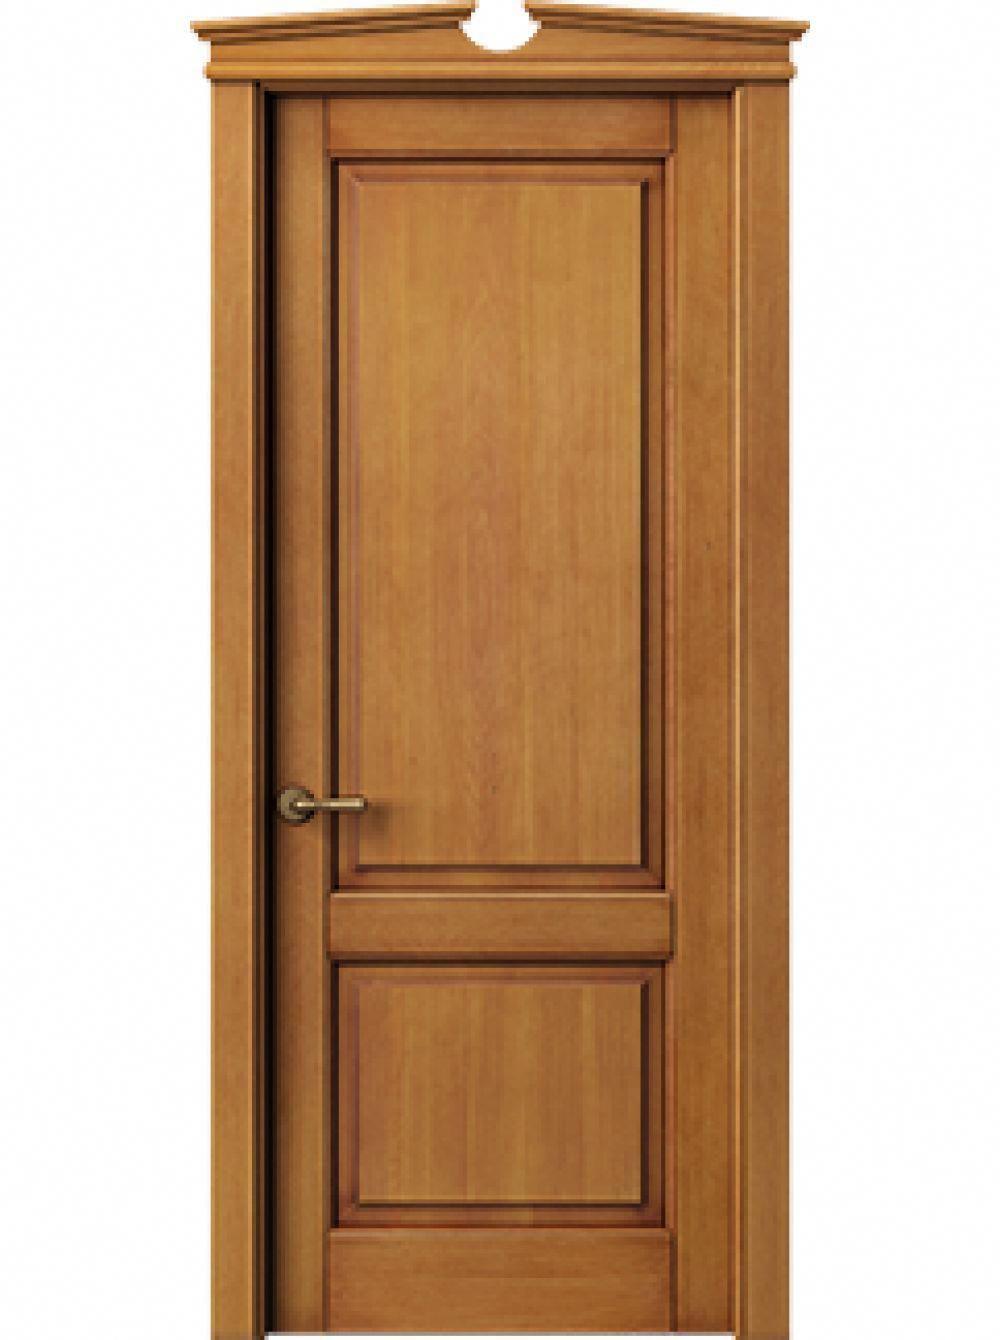 panel interior doors internal moulded plain wood also rh pinterest